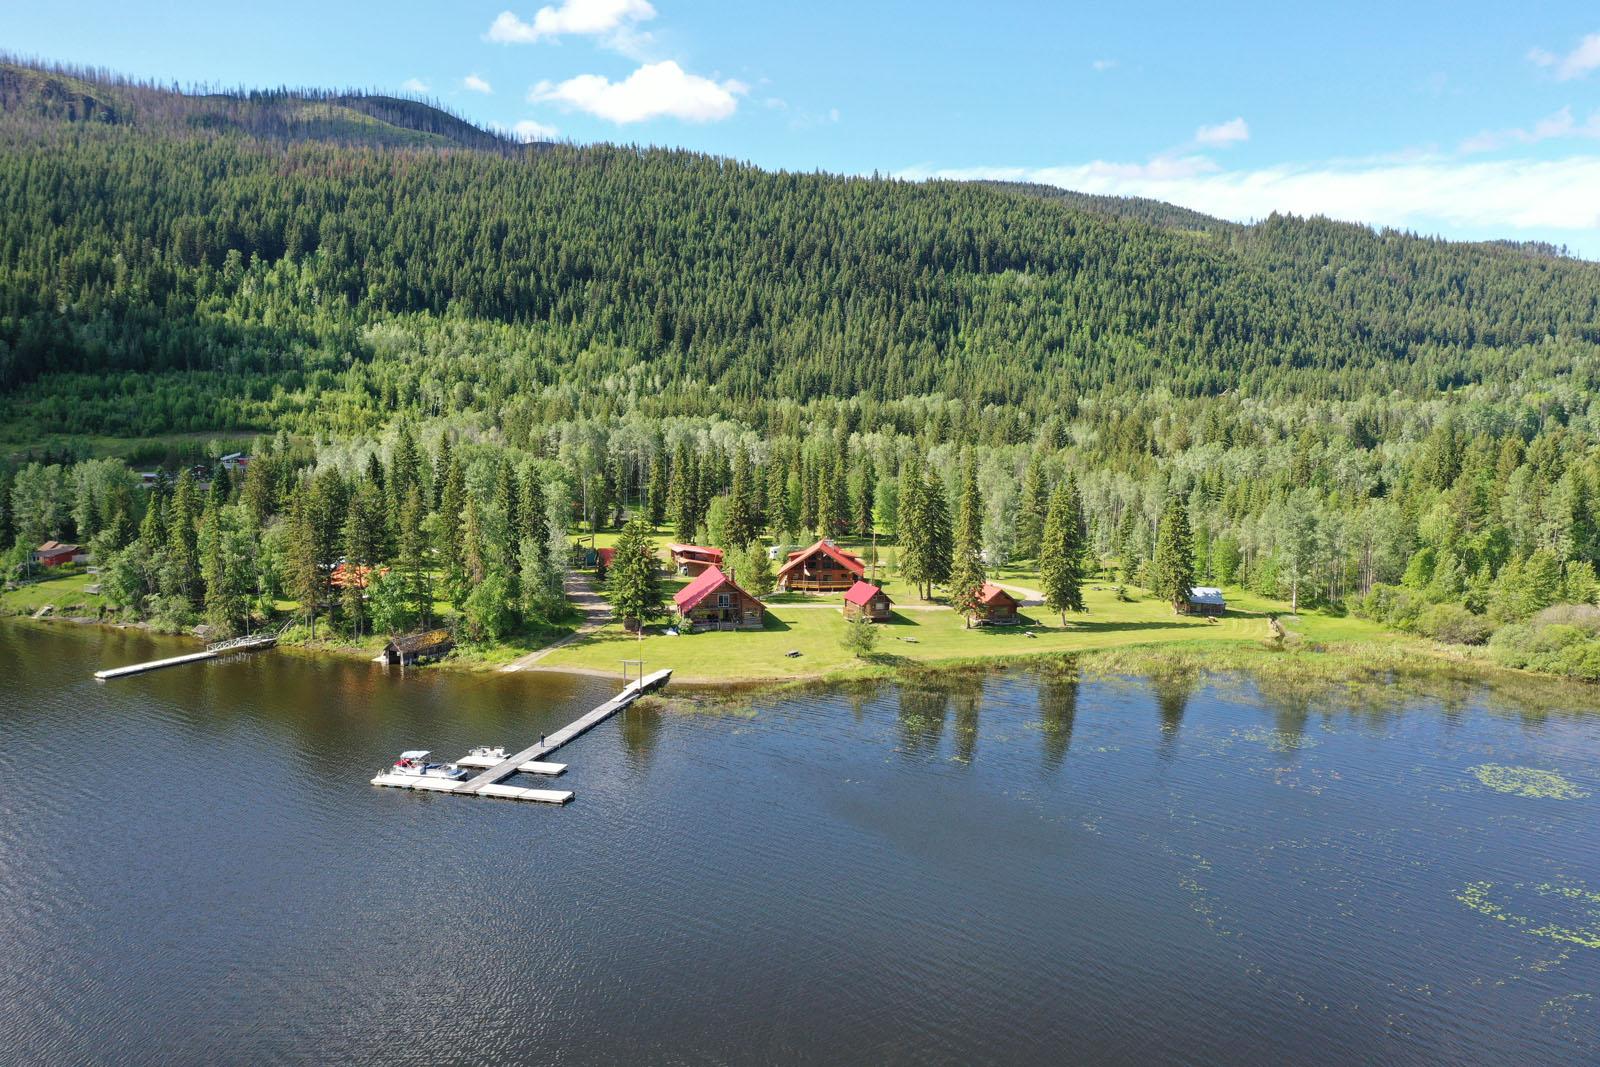 Canim lake resort 01